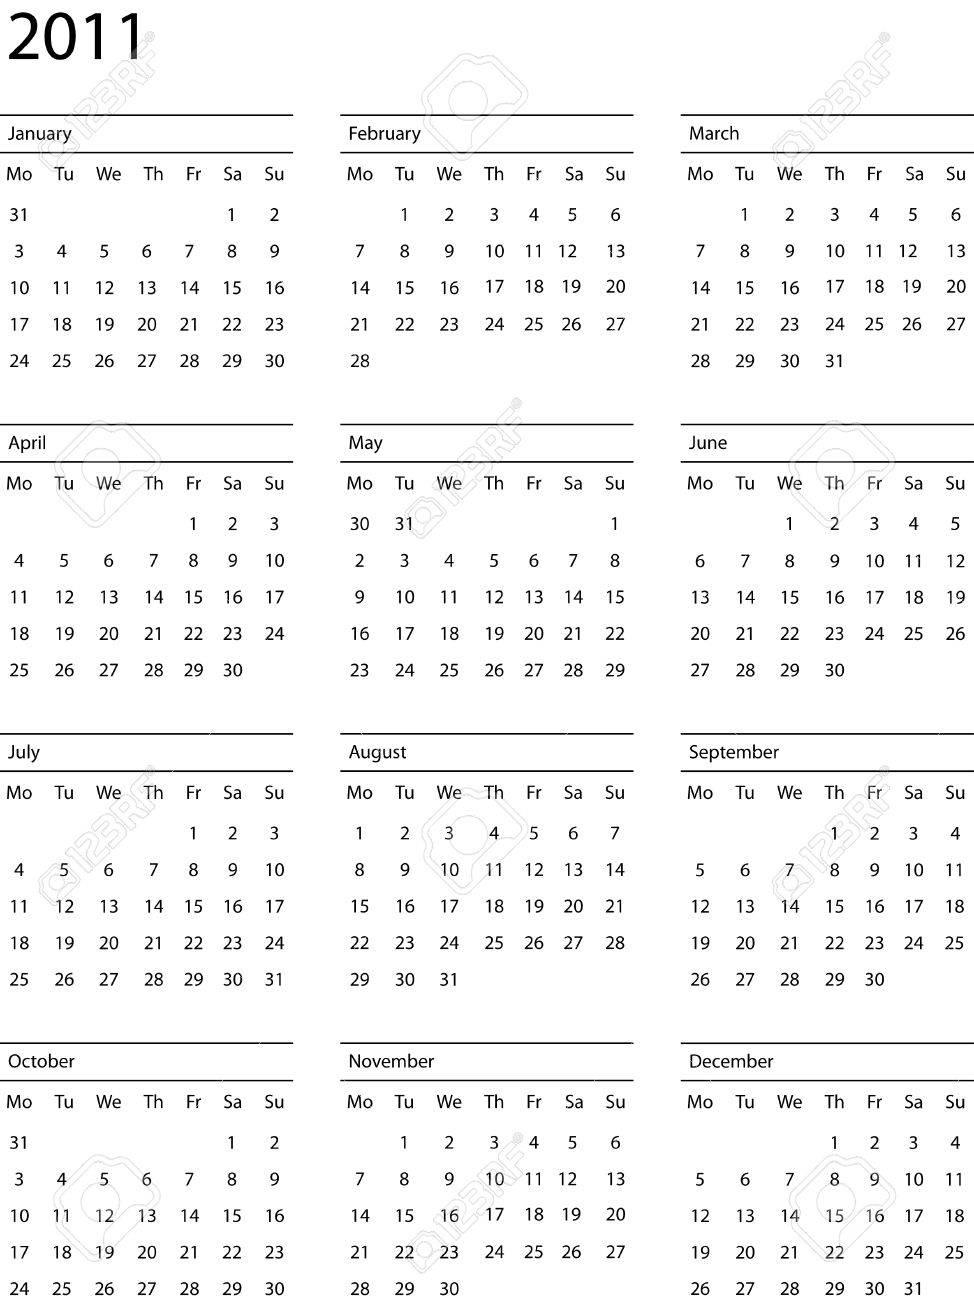 Berühmt Bearbeitbare Kalendervorlagen Ideen - Beispiel Anschreiben ...